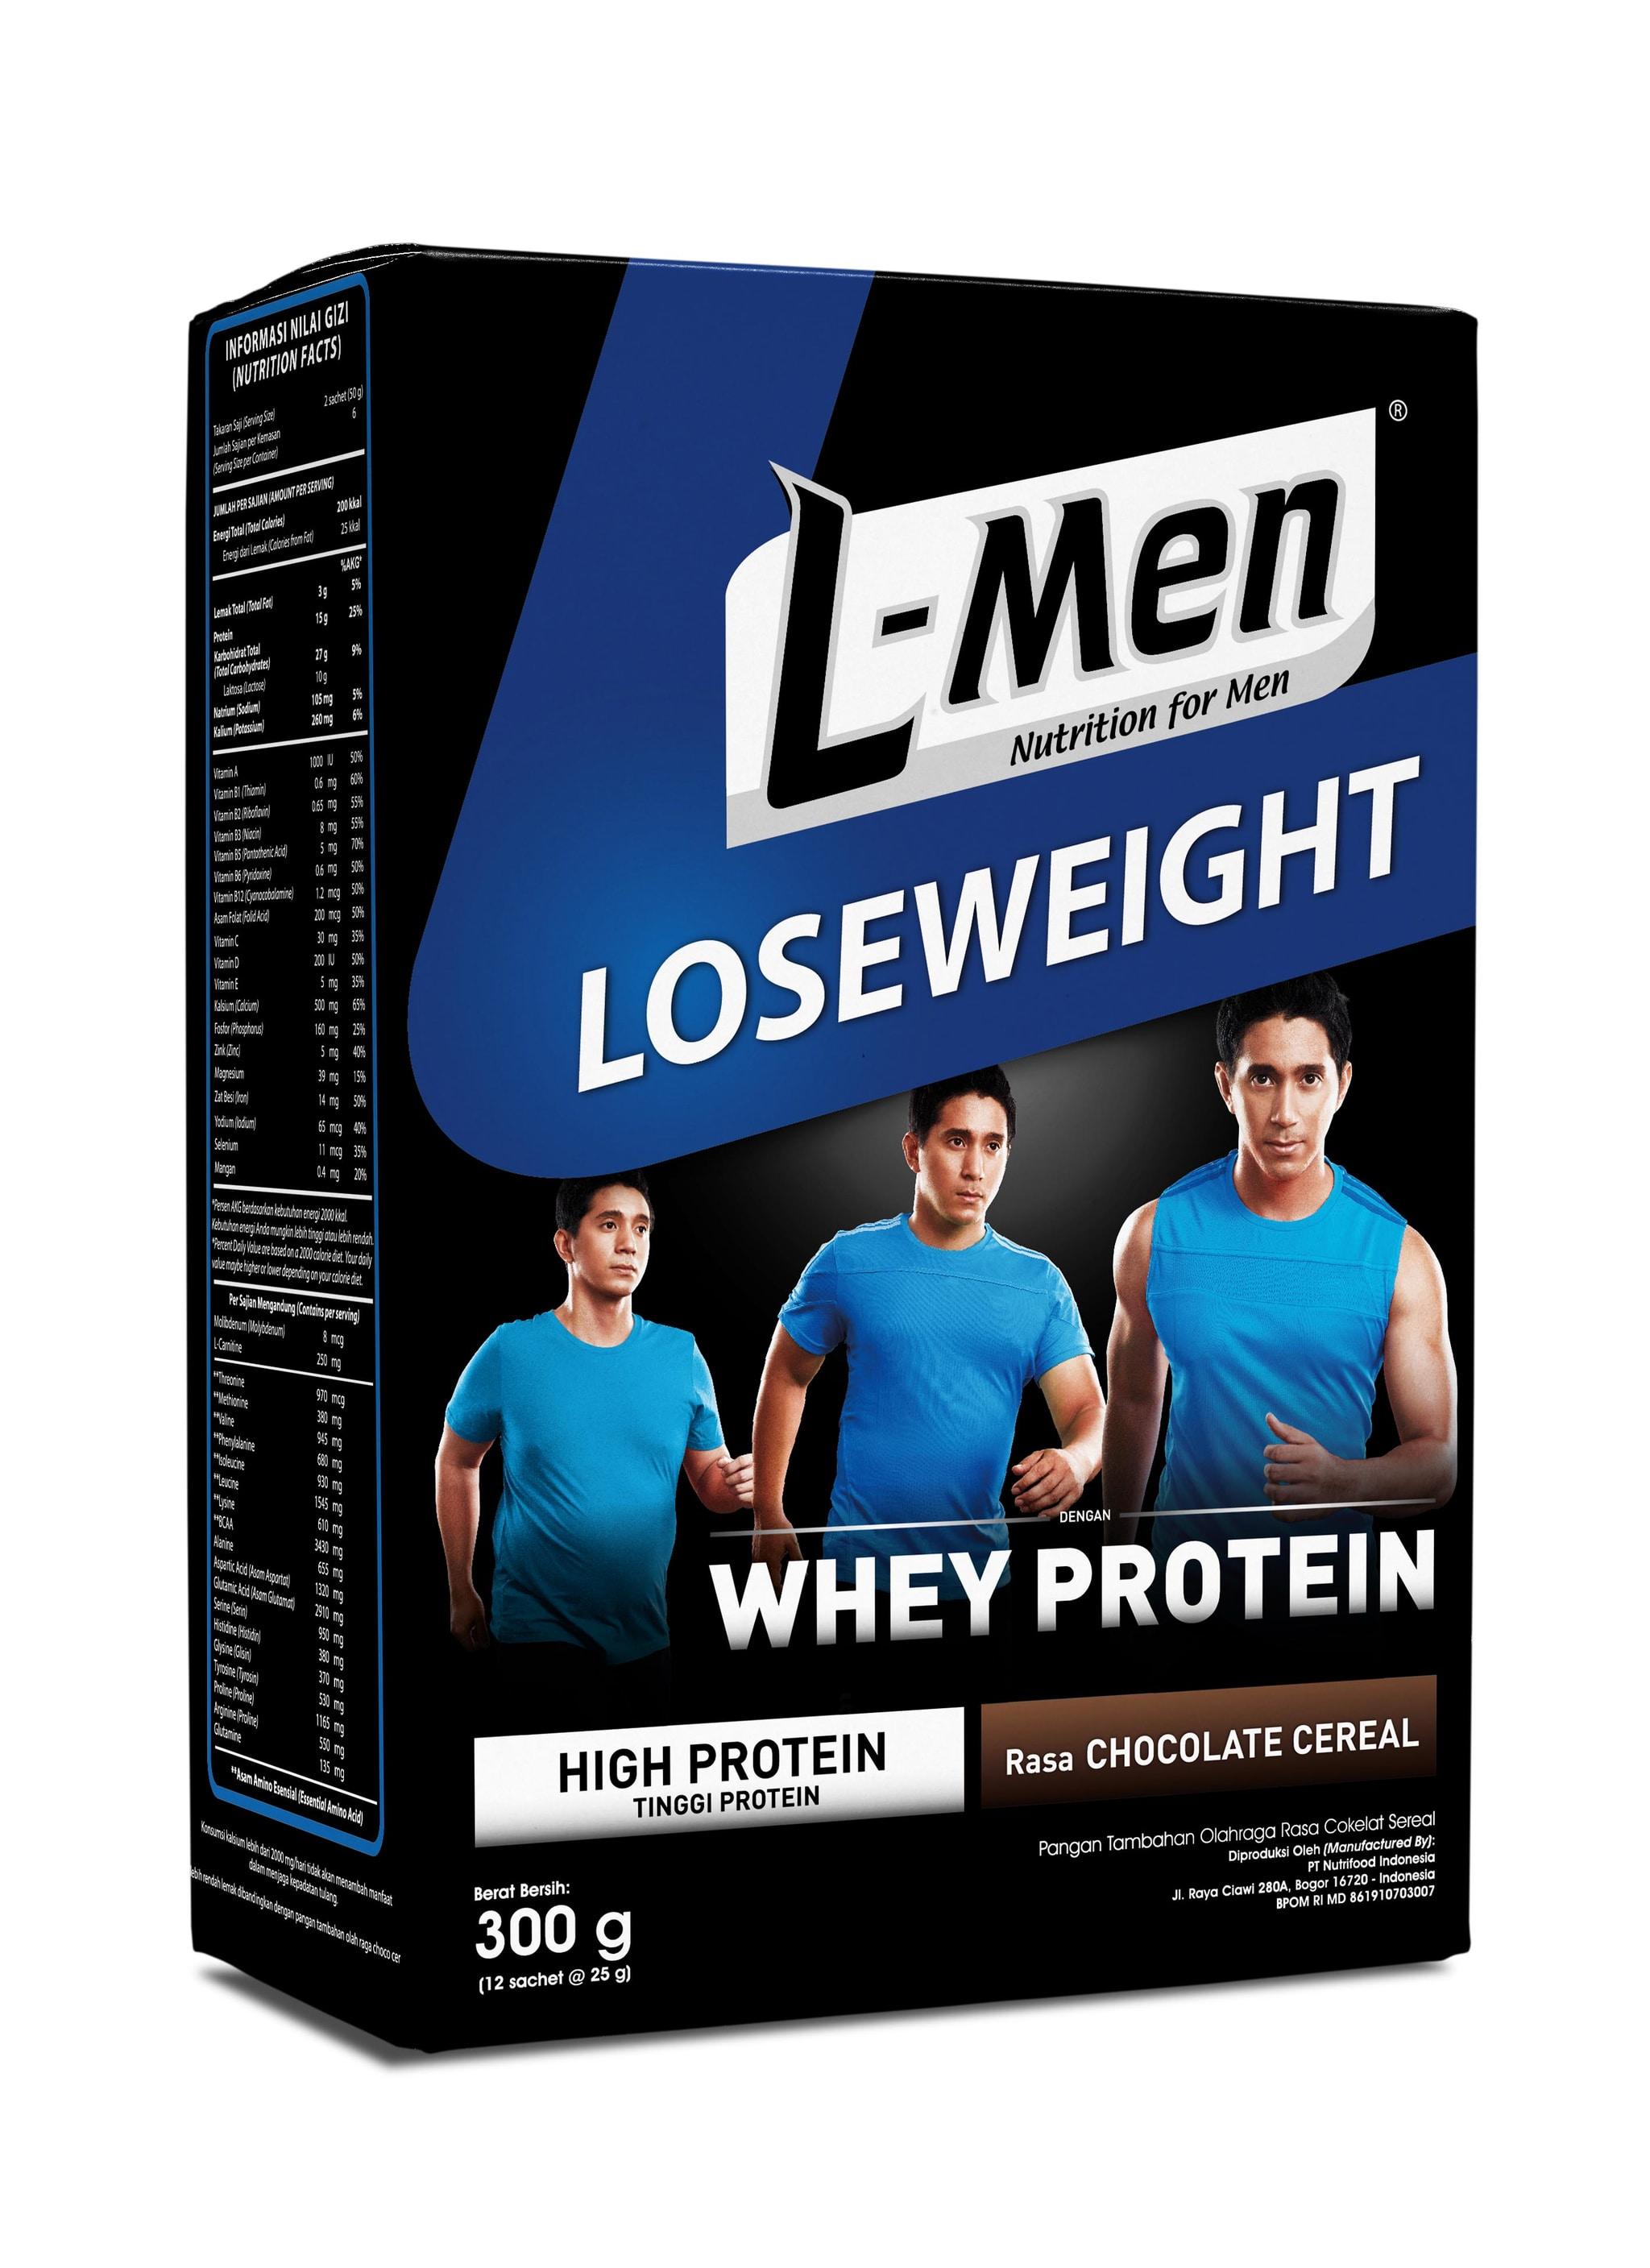 Jual L-Men Lose Weight Chocolate Cereal - NutriMart ...